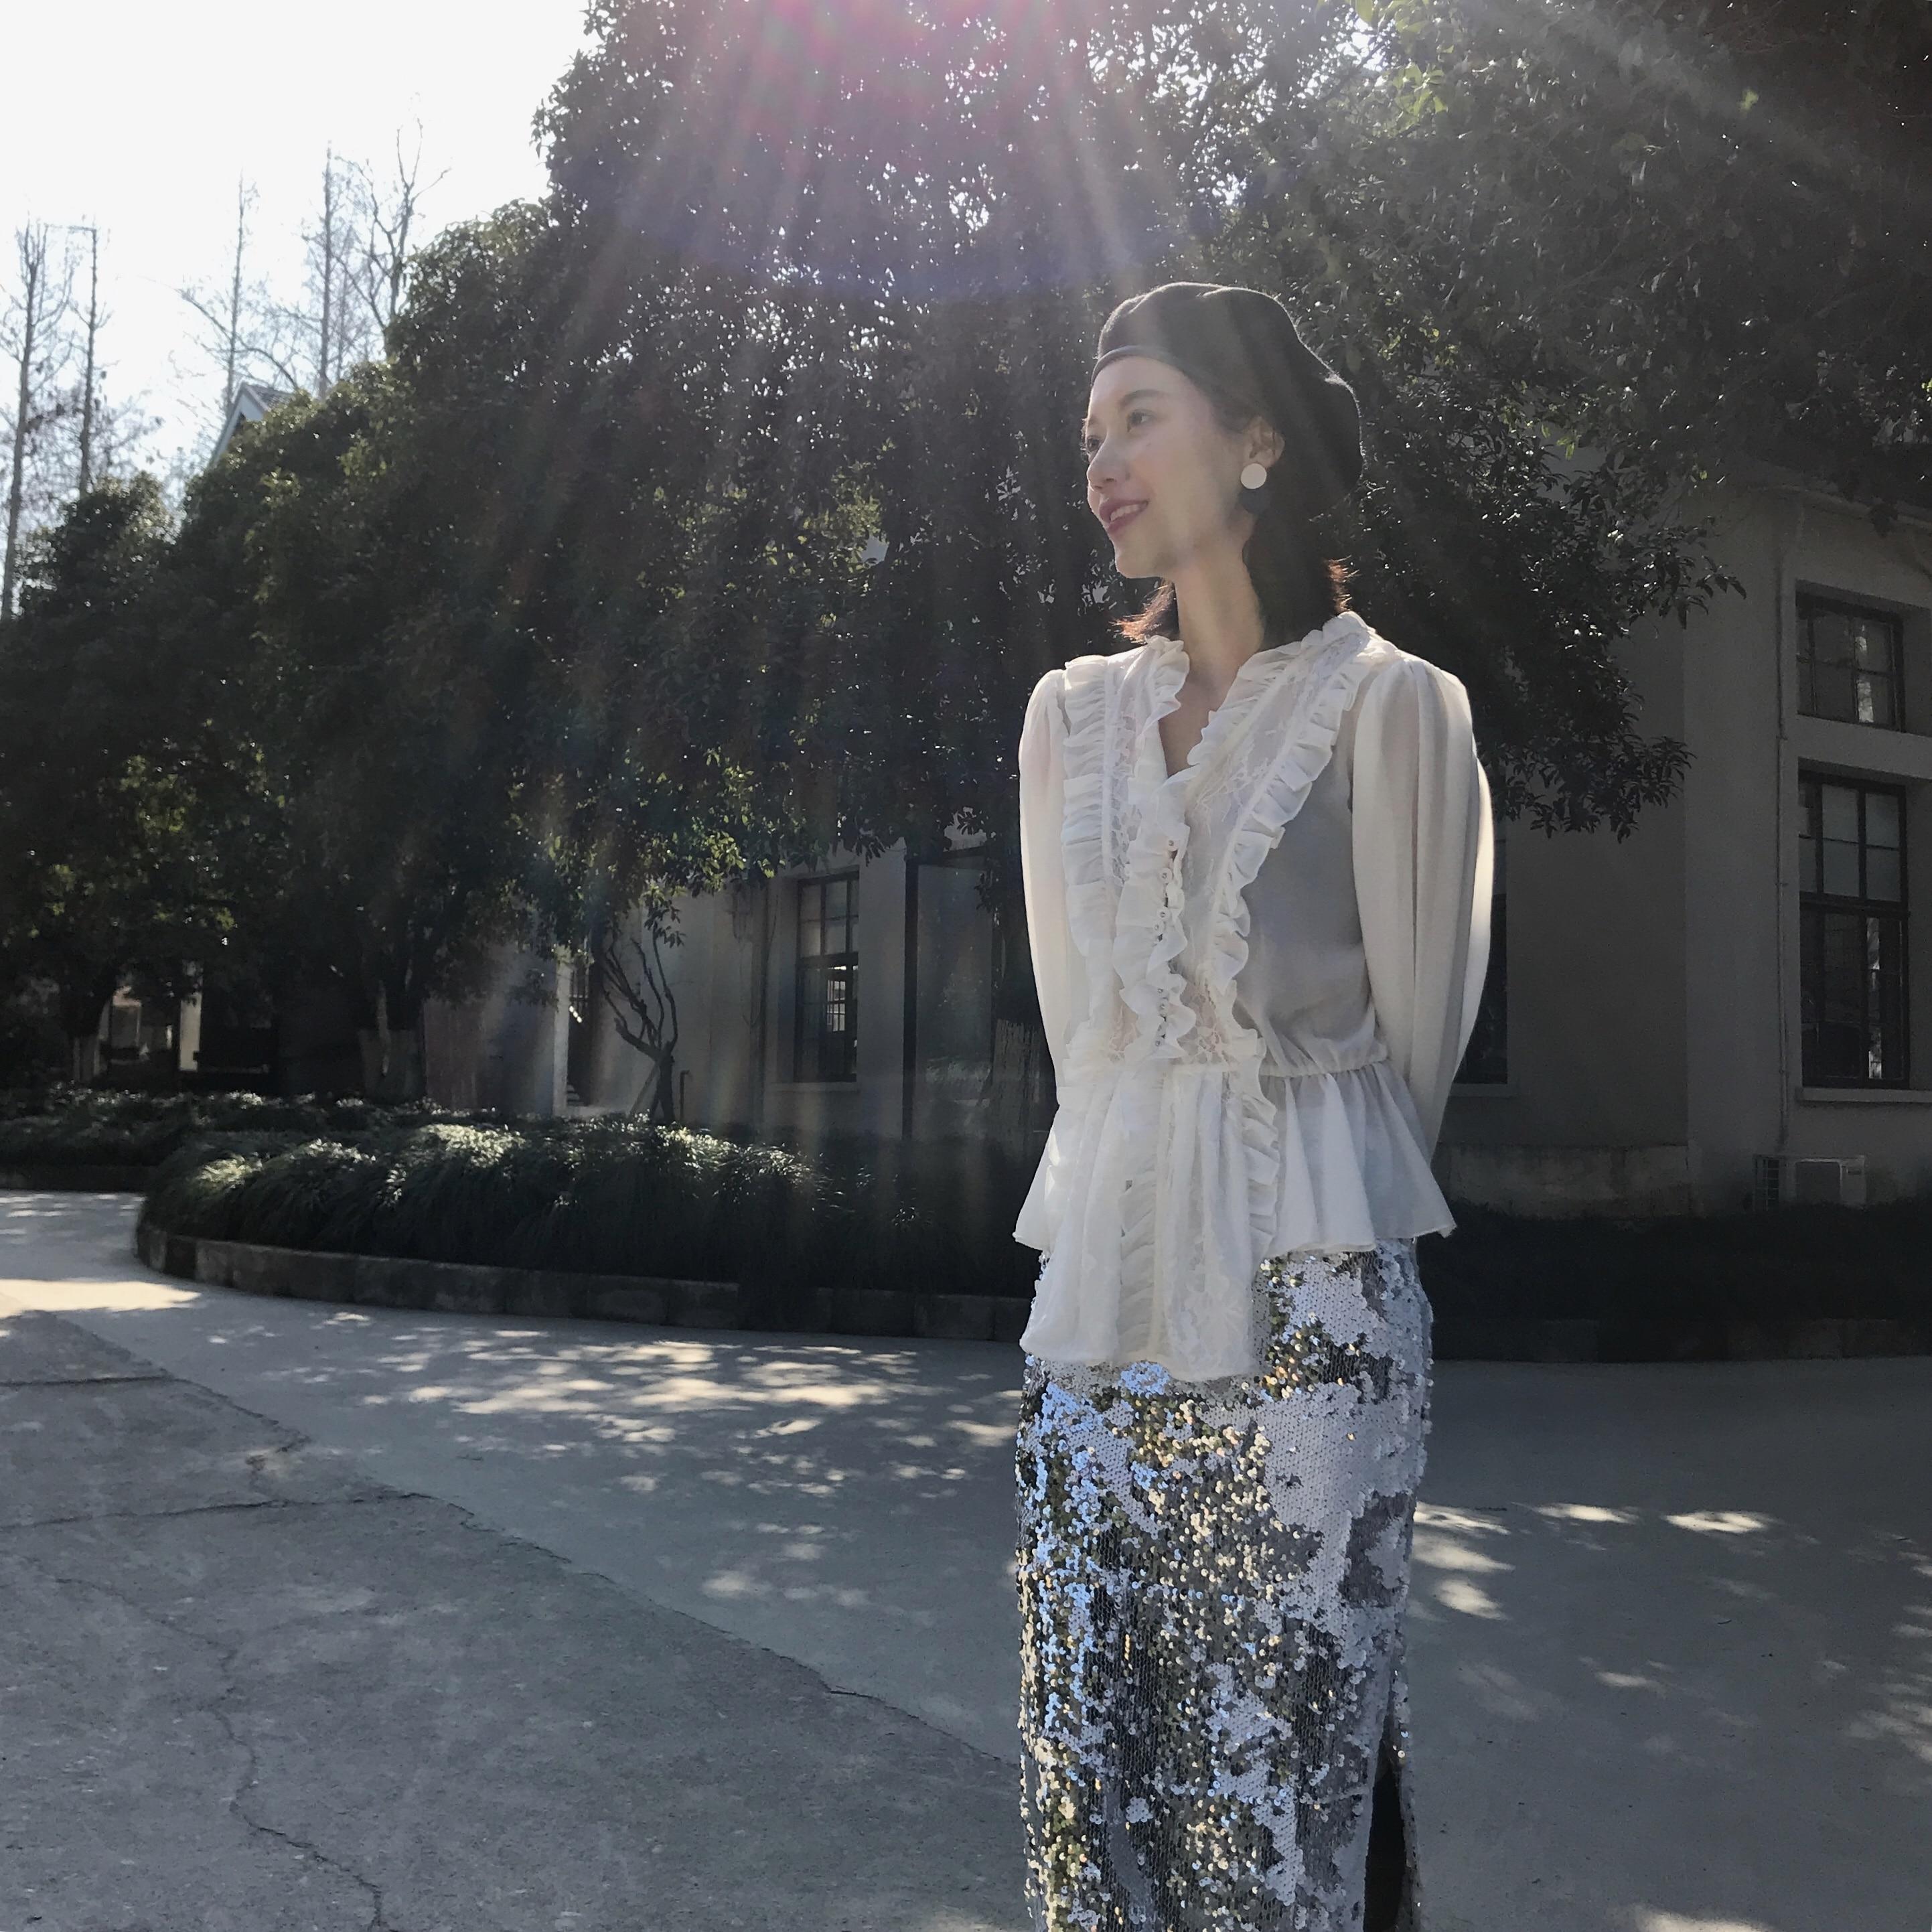 Frauen sommer hohl out Shirts Fance stil mit langen ärmeln elegante spitze Hemd Tops A292 - 4